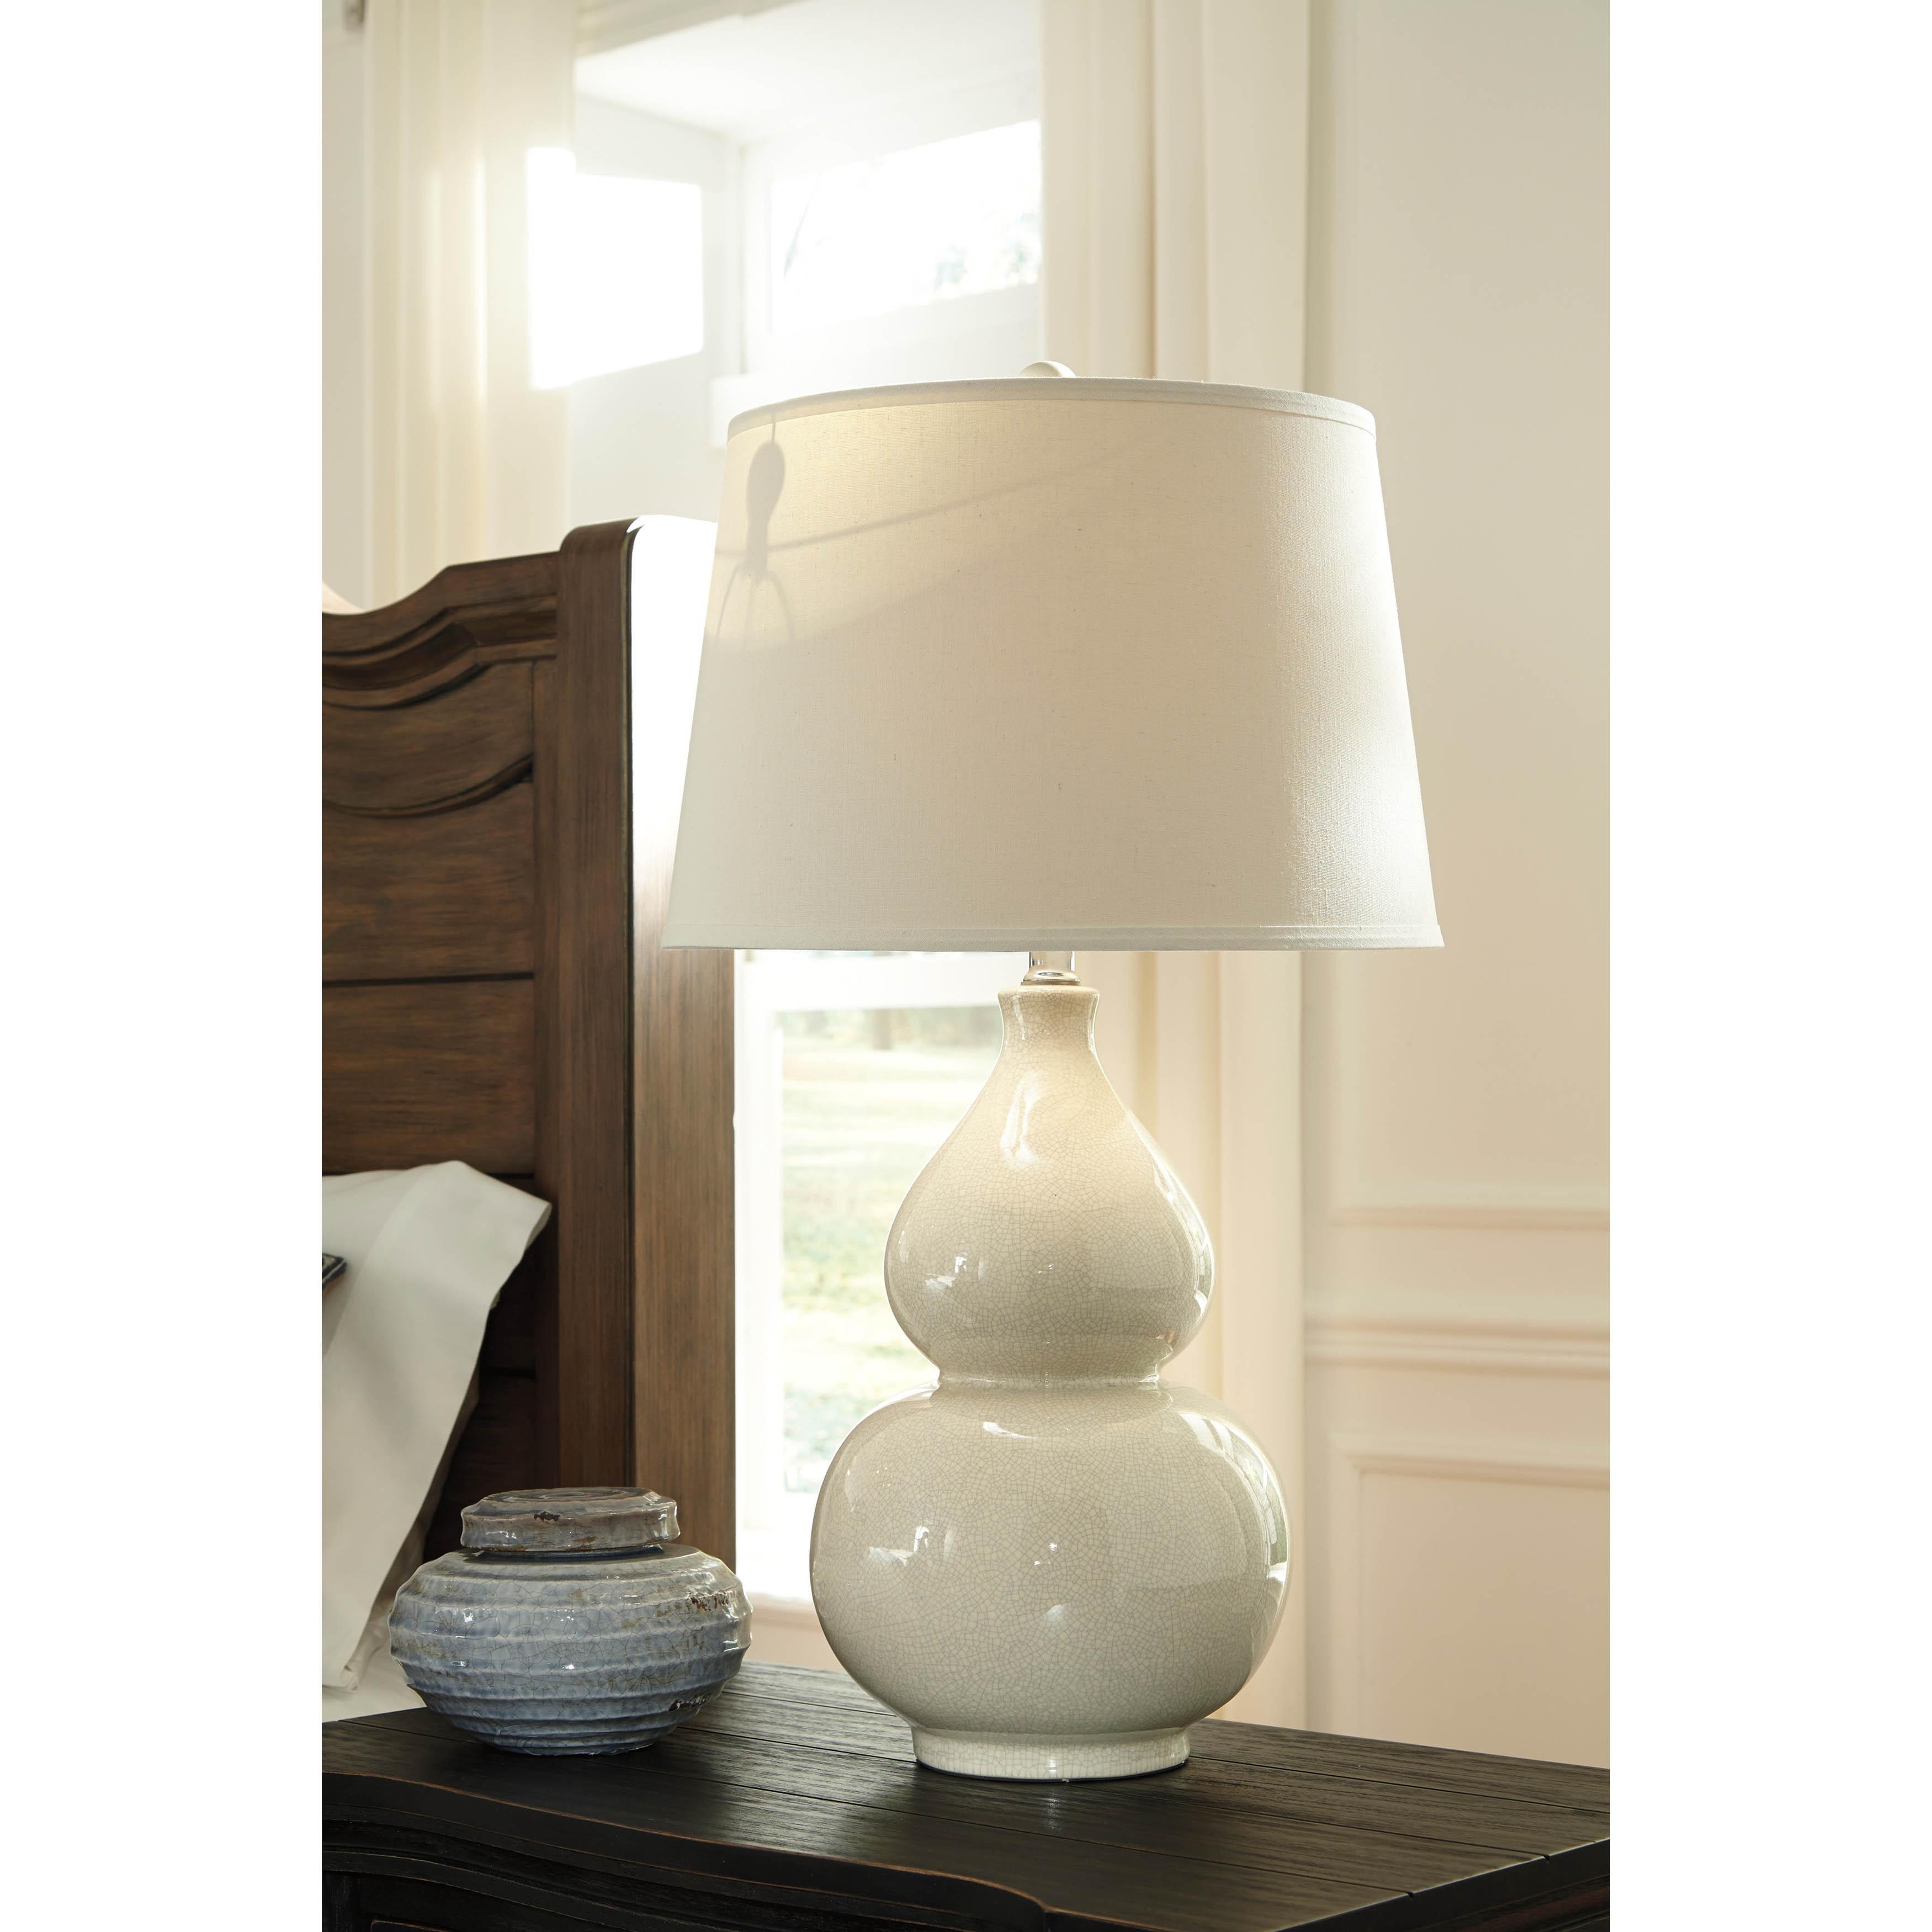 Saffi Cream 31 Inch Ceramic Table Lamp Overstock 10760916